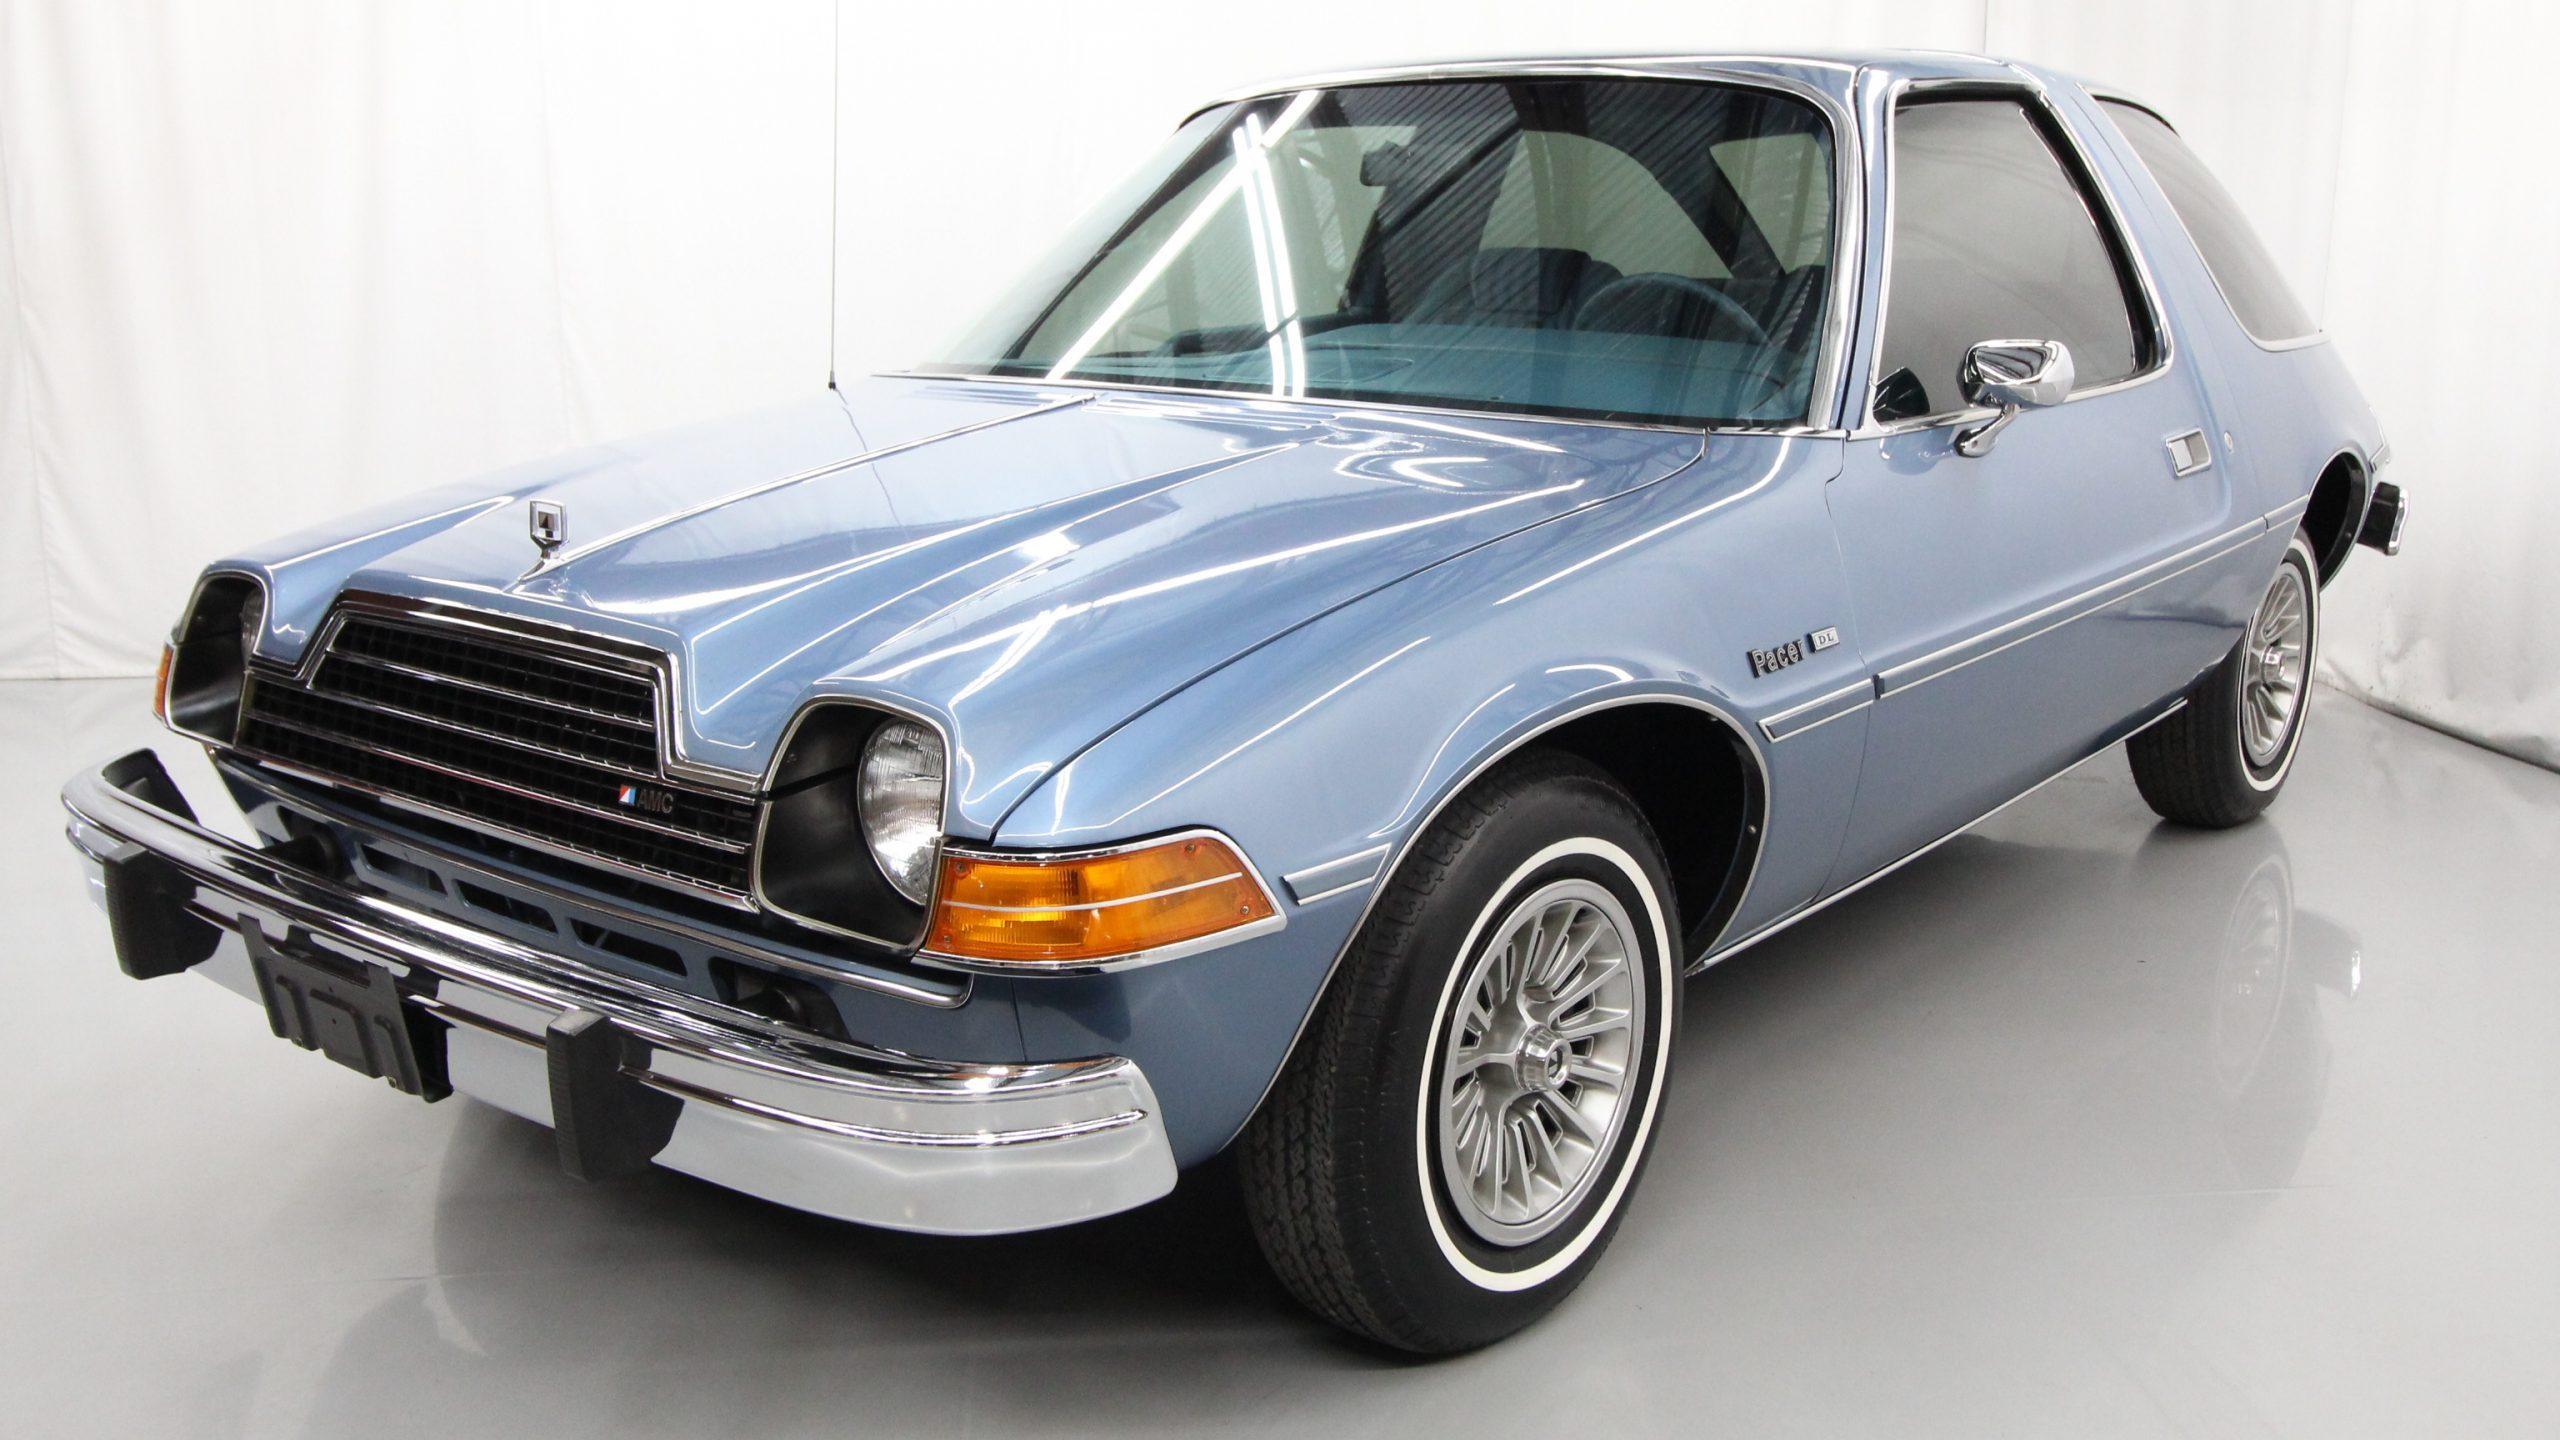 1980-AMC-Pacer-DL_R36 front three-quarter